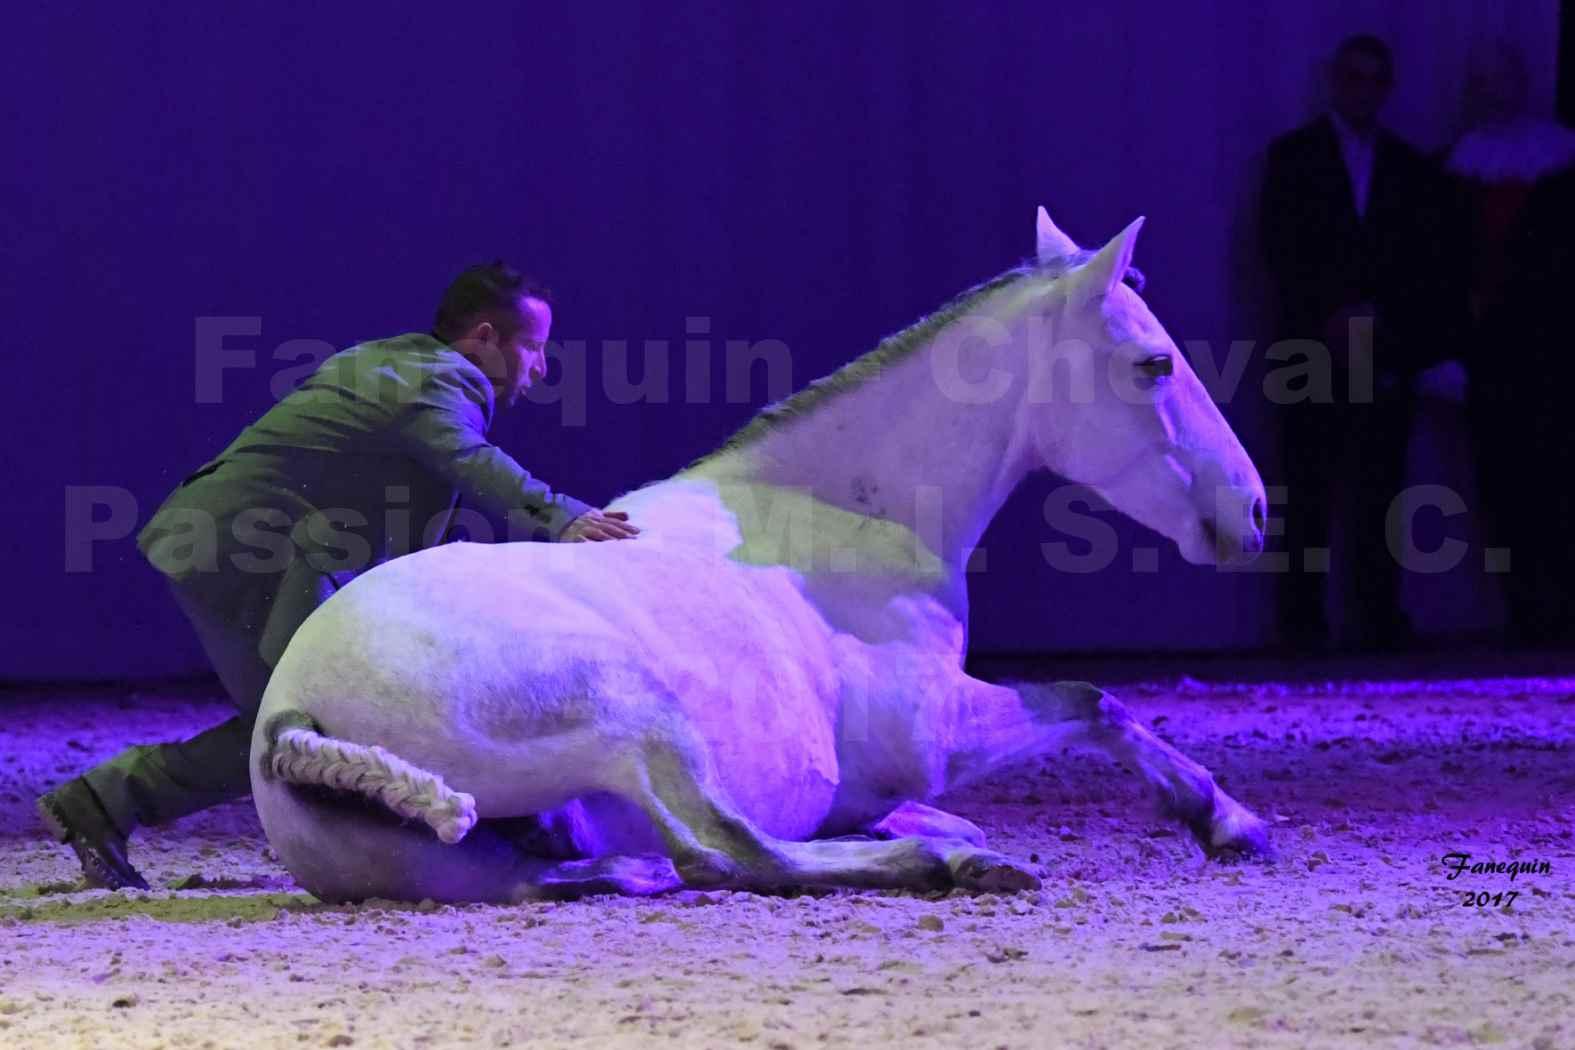 Cheval Passion 2017 - M. I. S. E. C. - Ludovic LONGO & 1 cheval en liberté - 19